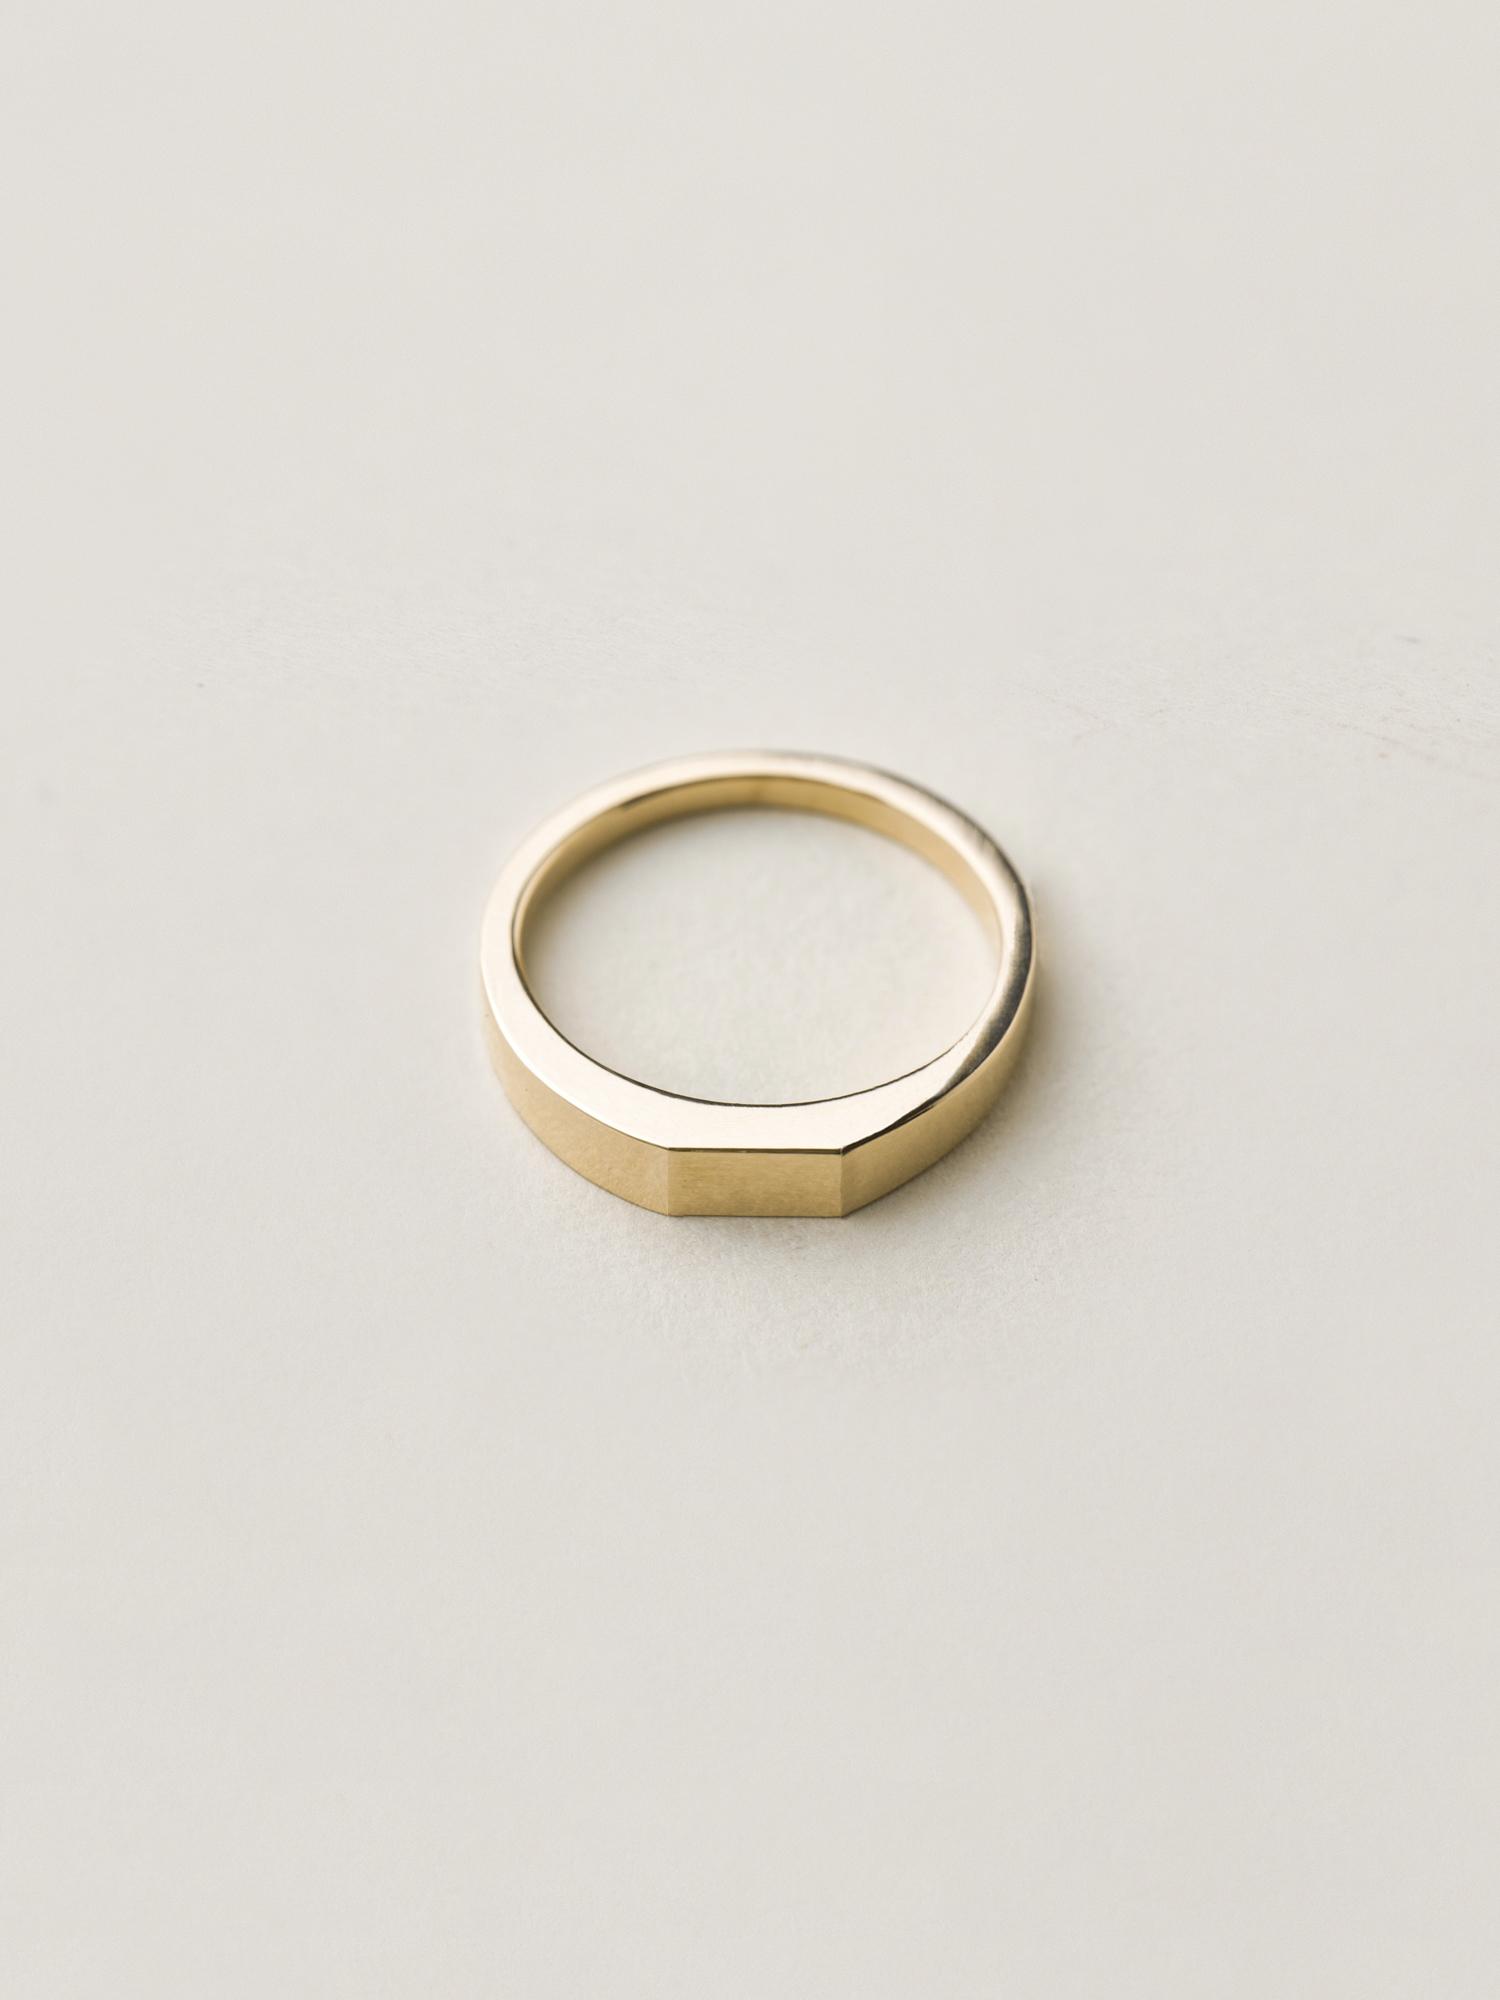 Verlobungsring-Gold-Siegelring-Christina-Pauls2.jpg